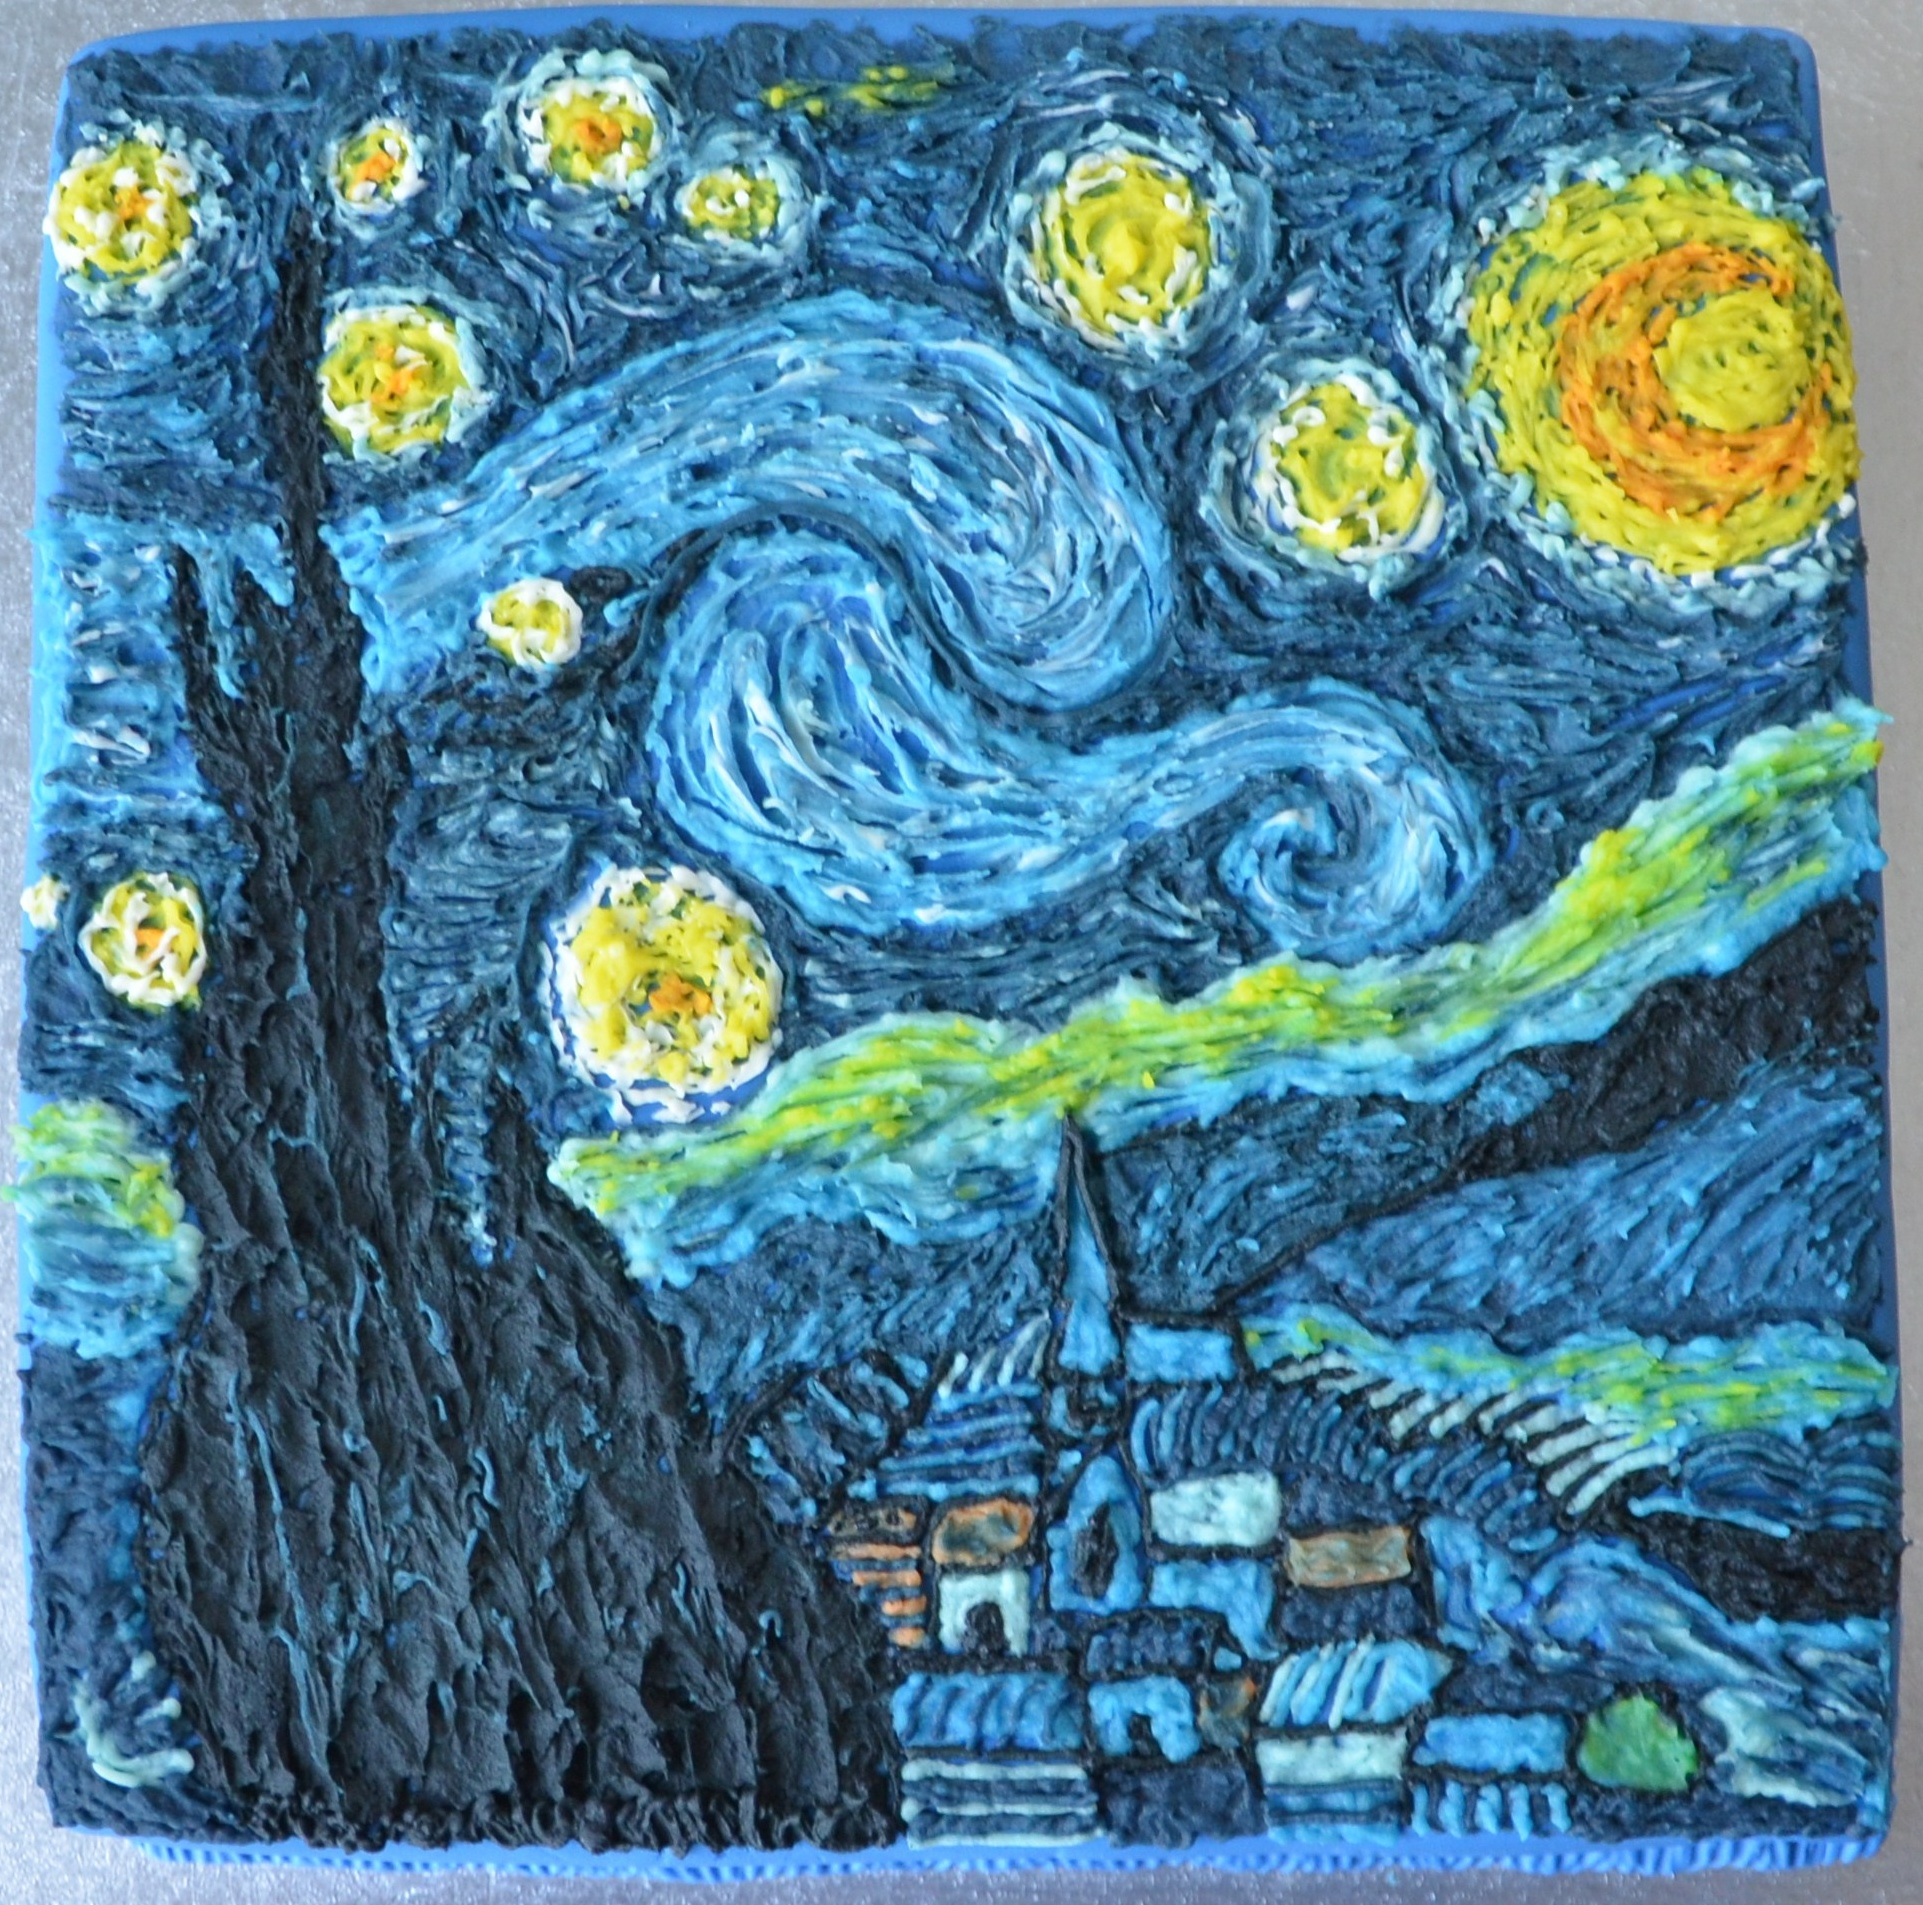 Starry night vincent van gogh essay